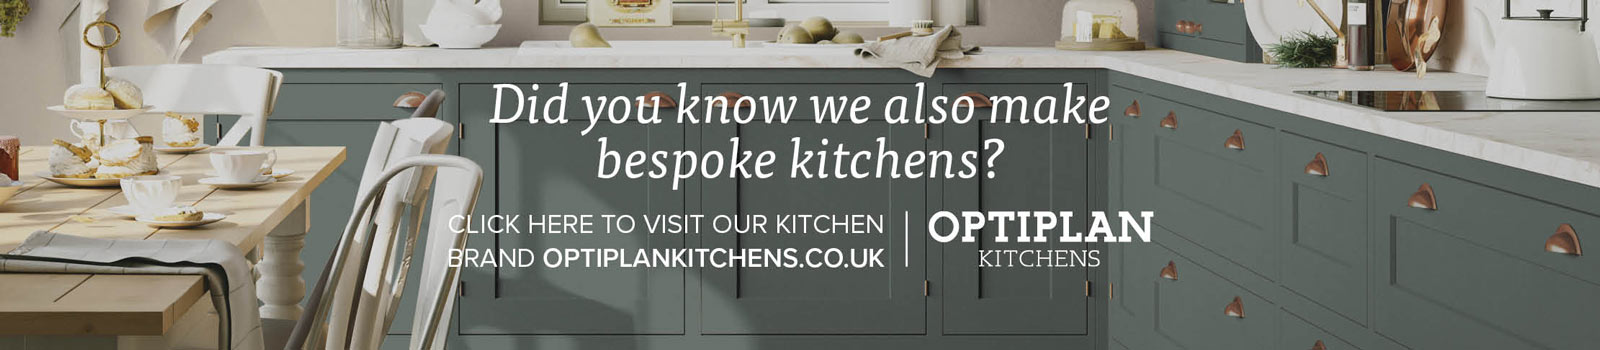 Optiplan Kitchens